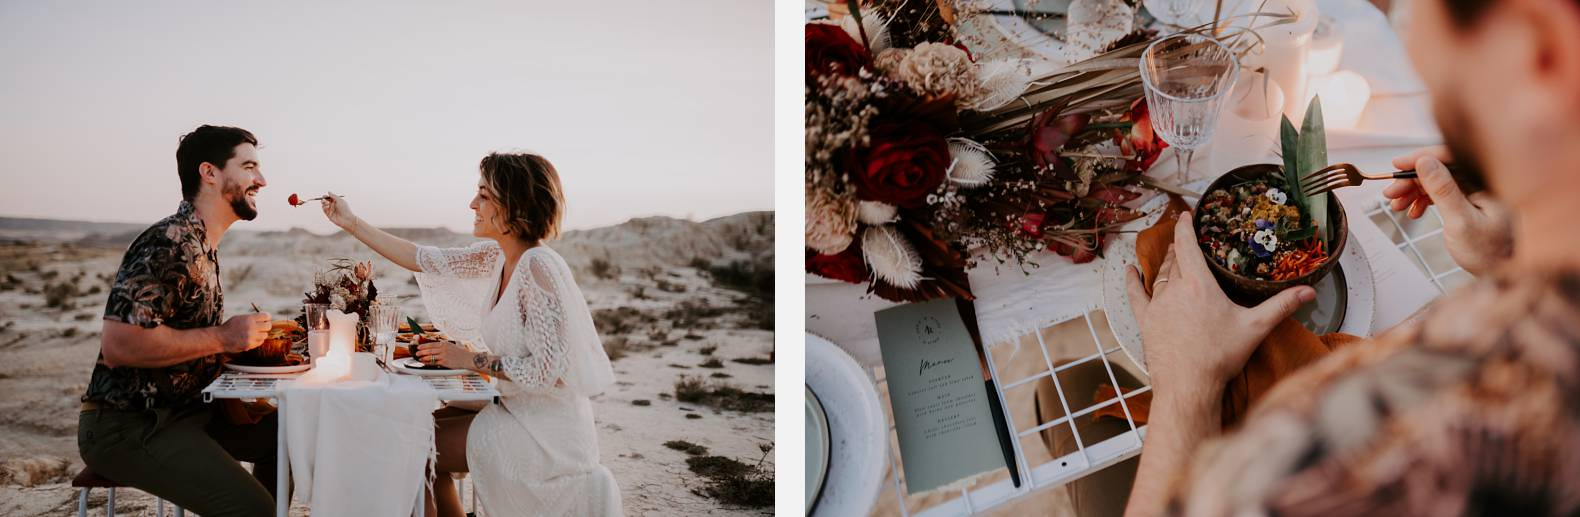 mariage espagne bardenas festival you and me elopement photographe bel esprit desert 0057